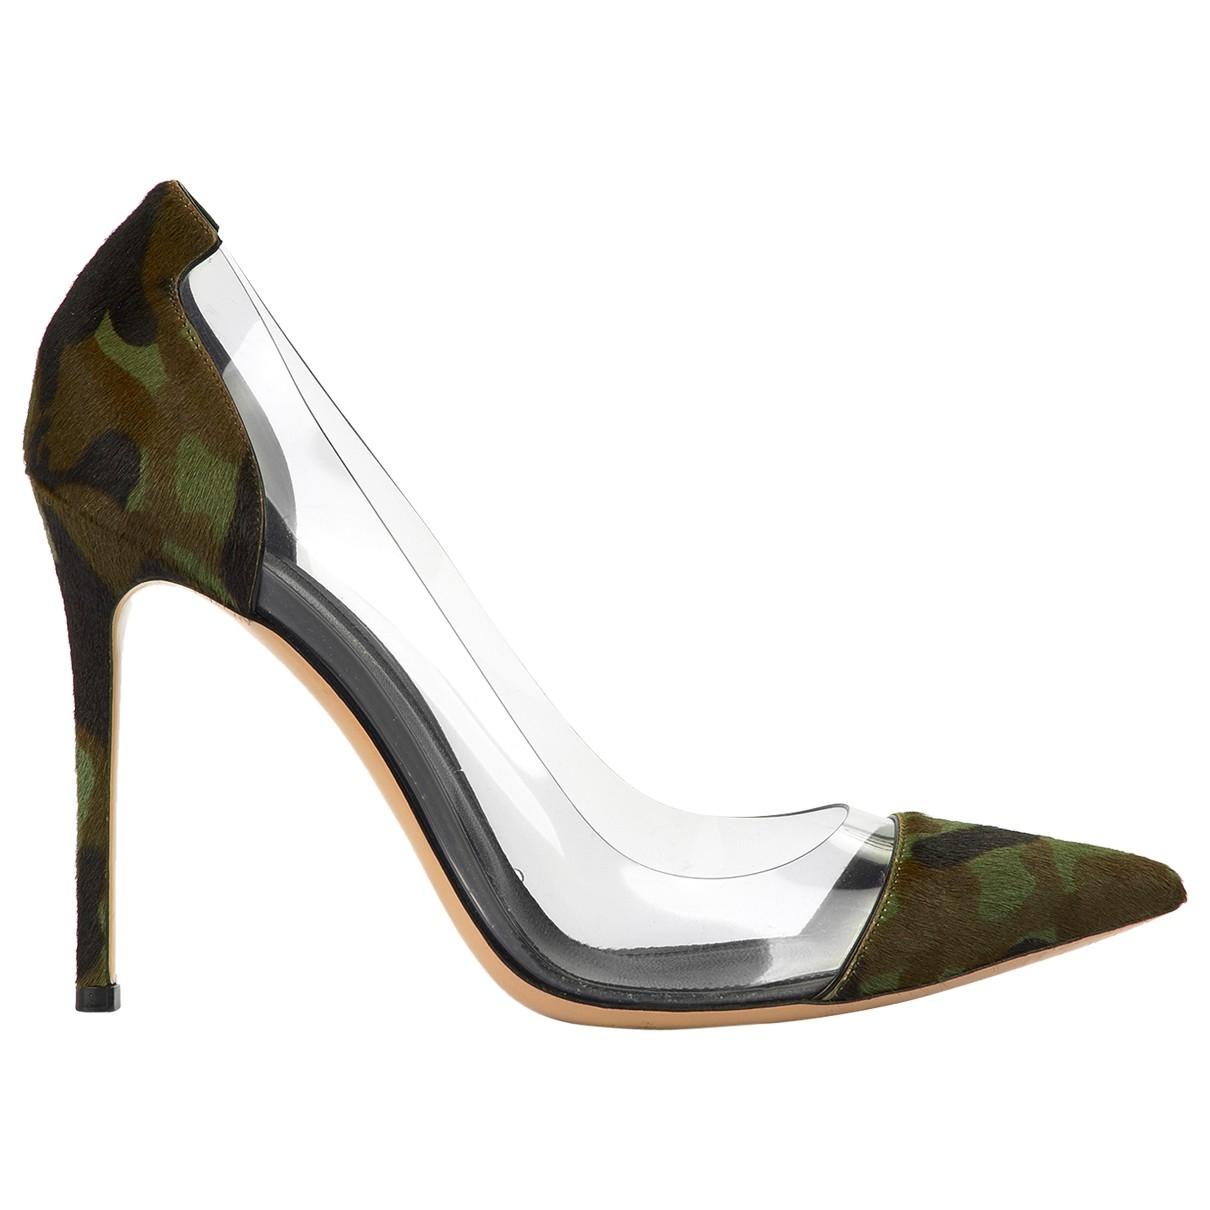 Gianvito Rossi - Escarpins Plexi pour femme en cuir - vert